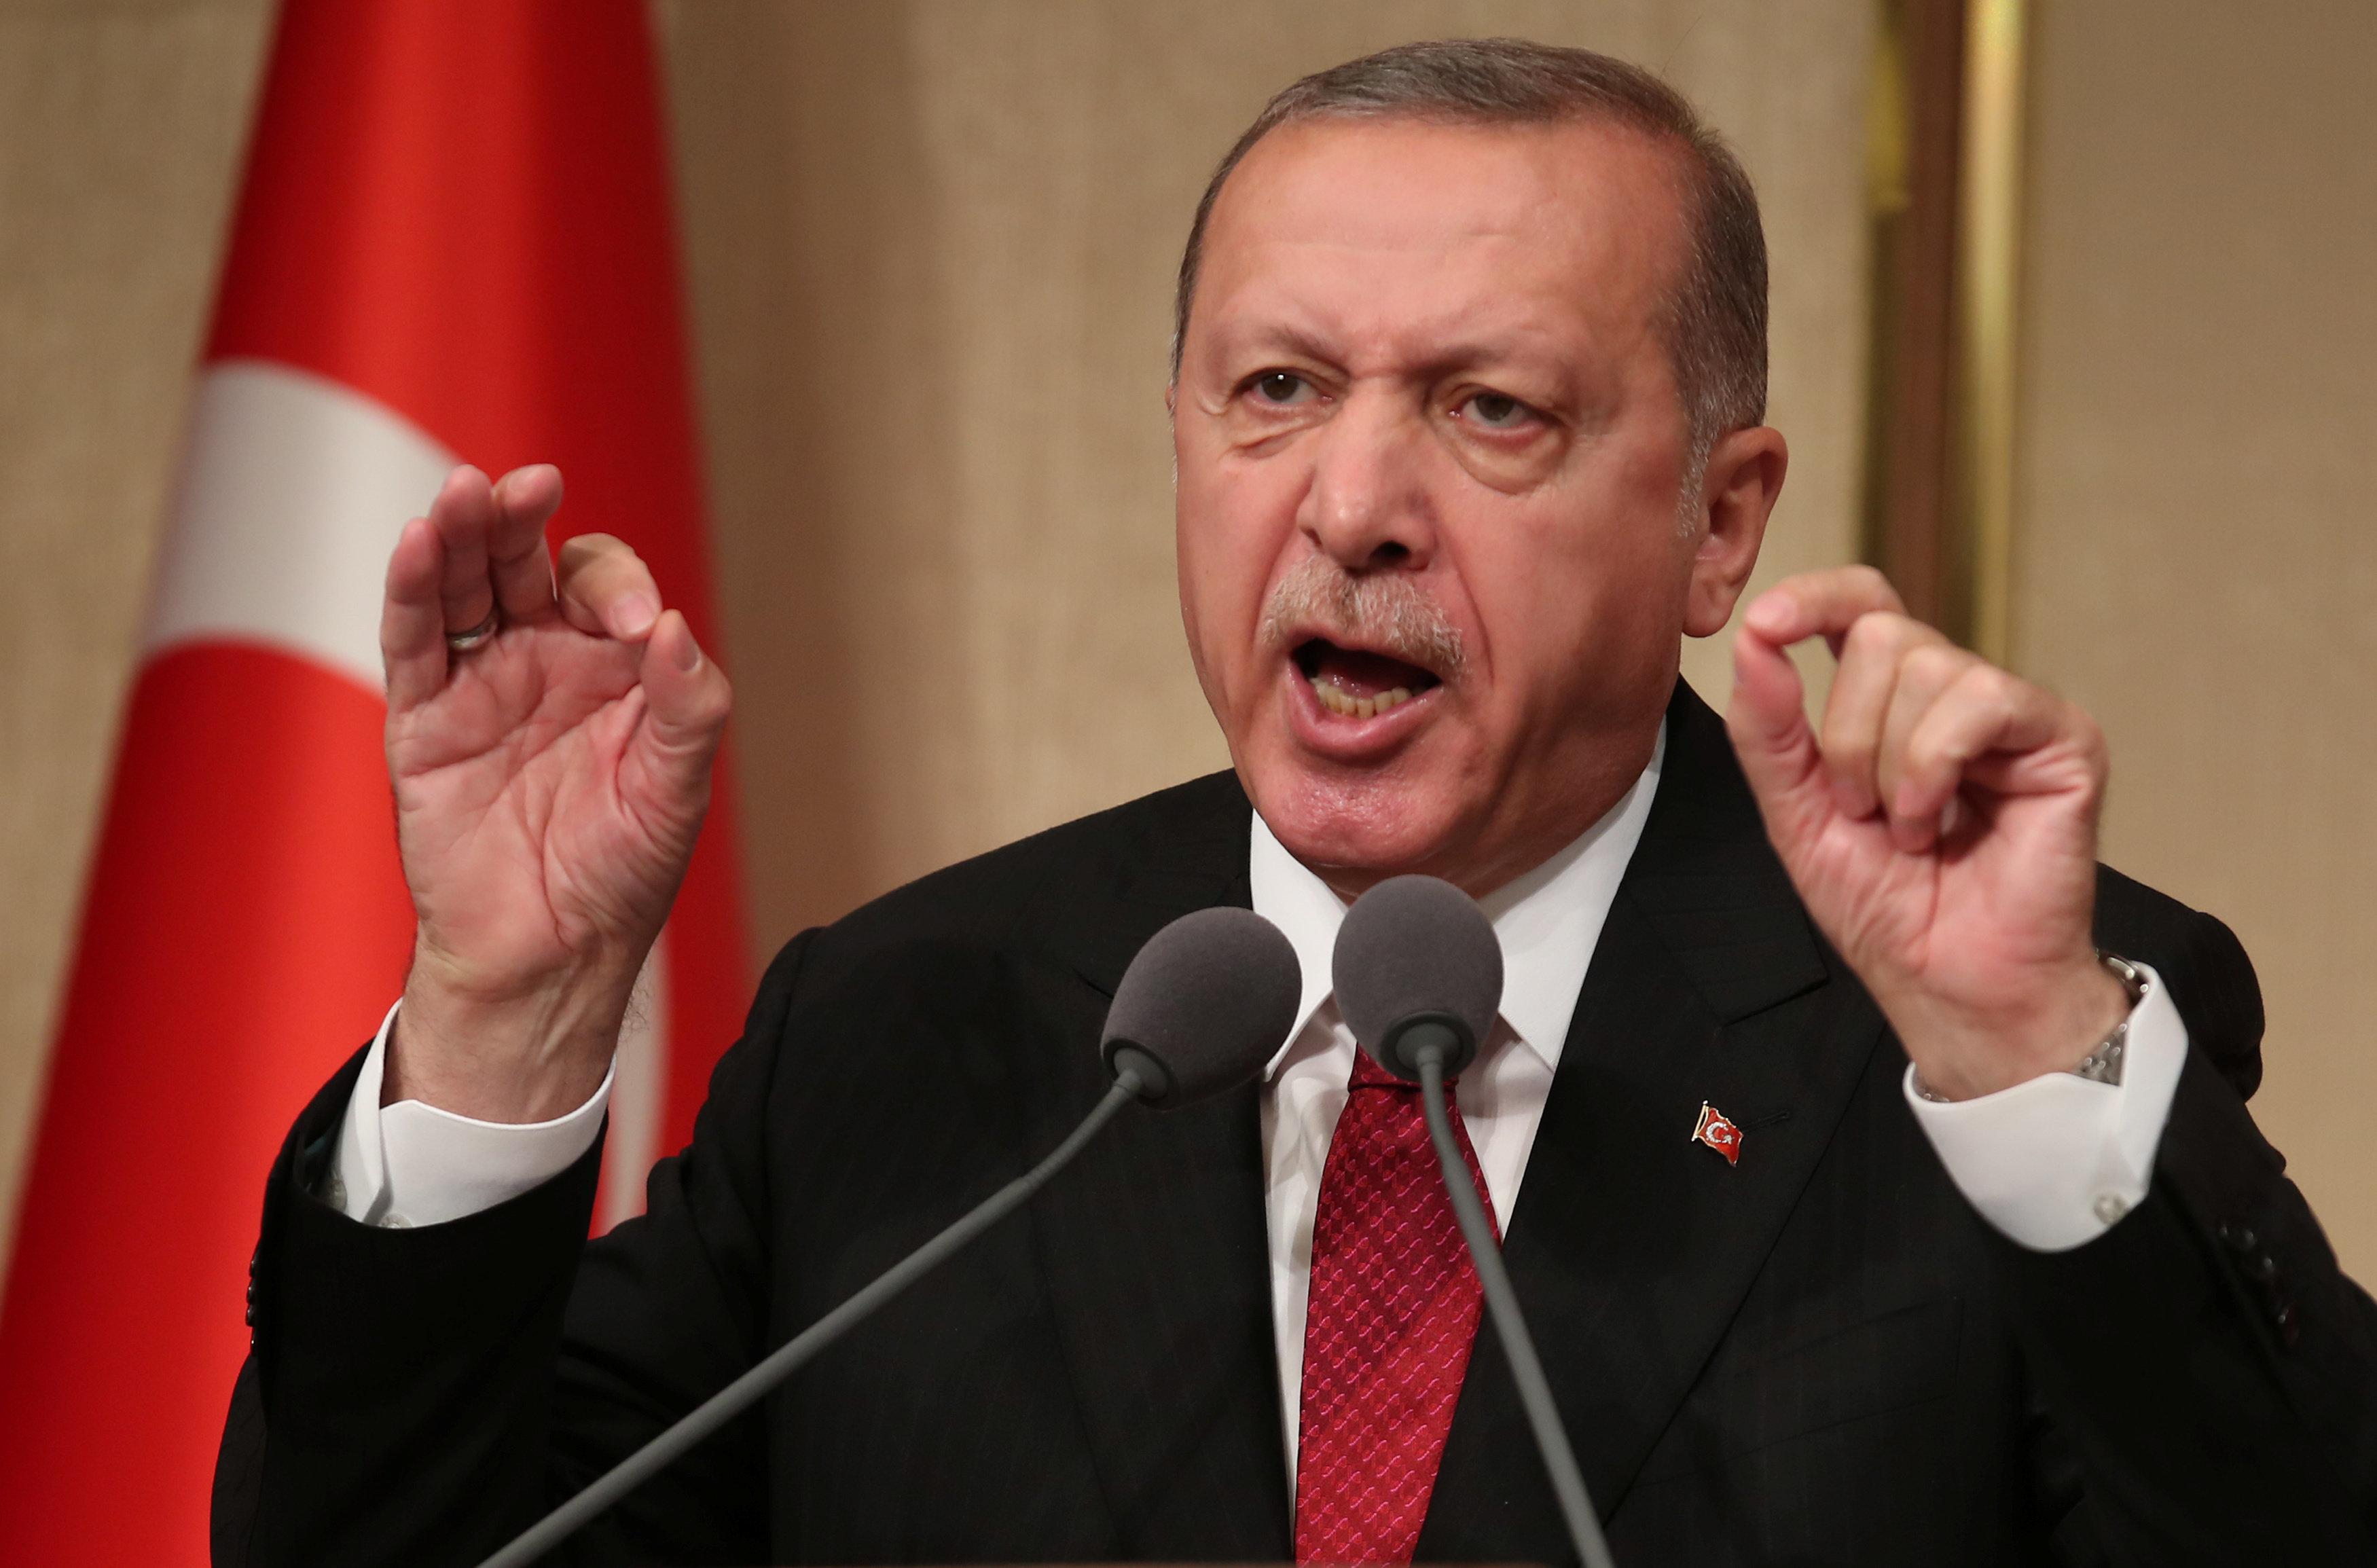 Autos, Alkohol, Kosmetik: Türkei verhängt neue Zölle auf viele